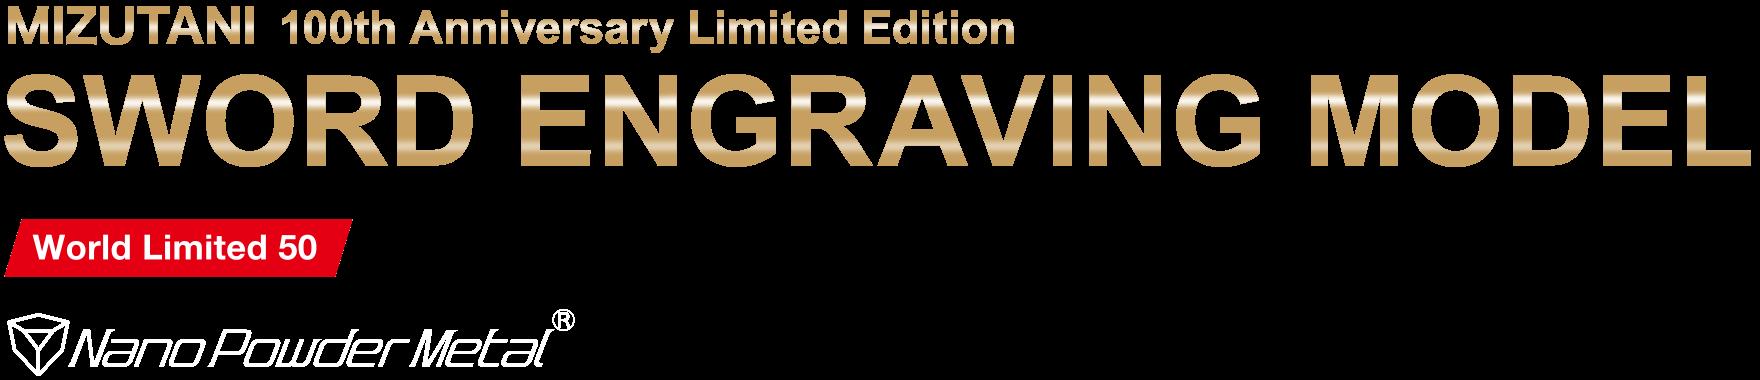 MIZUTANI 100th Anniversary Limited Edition SWORD ENGRAVING MODEL